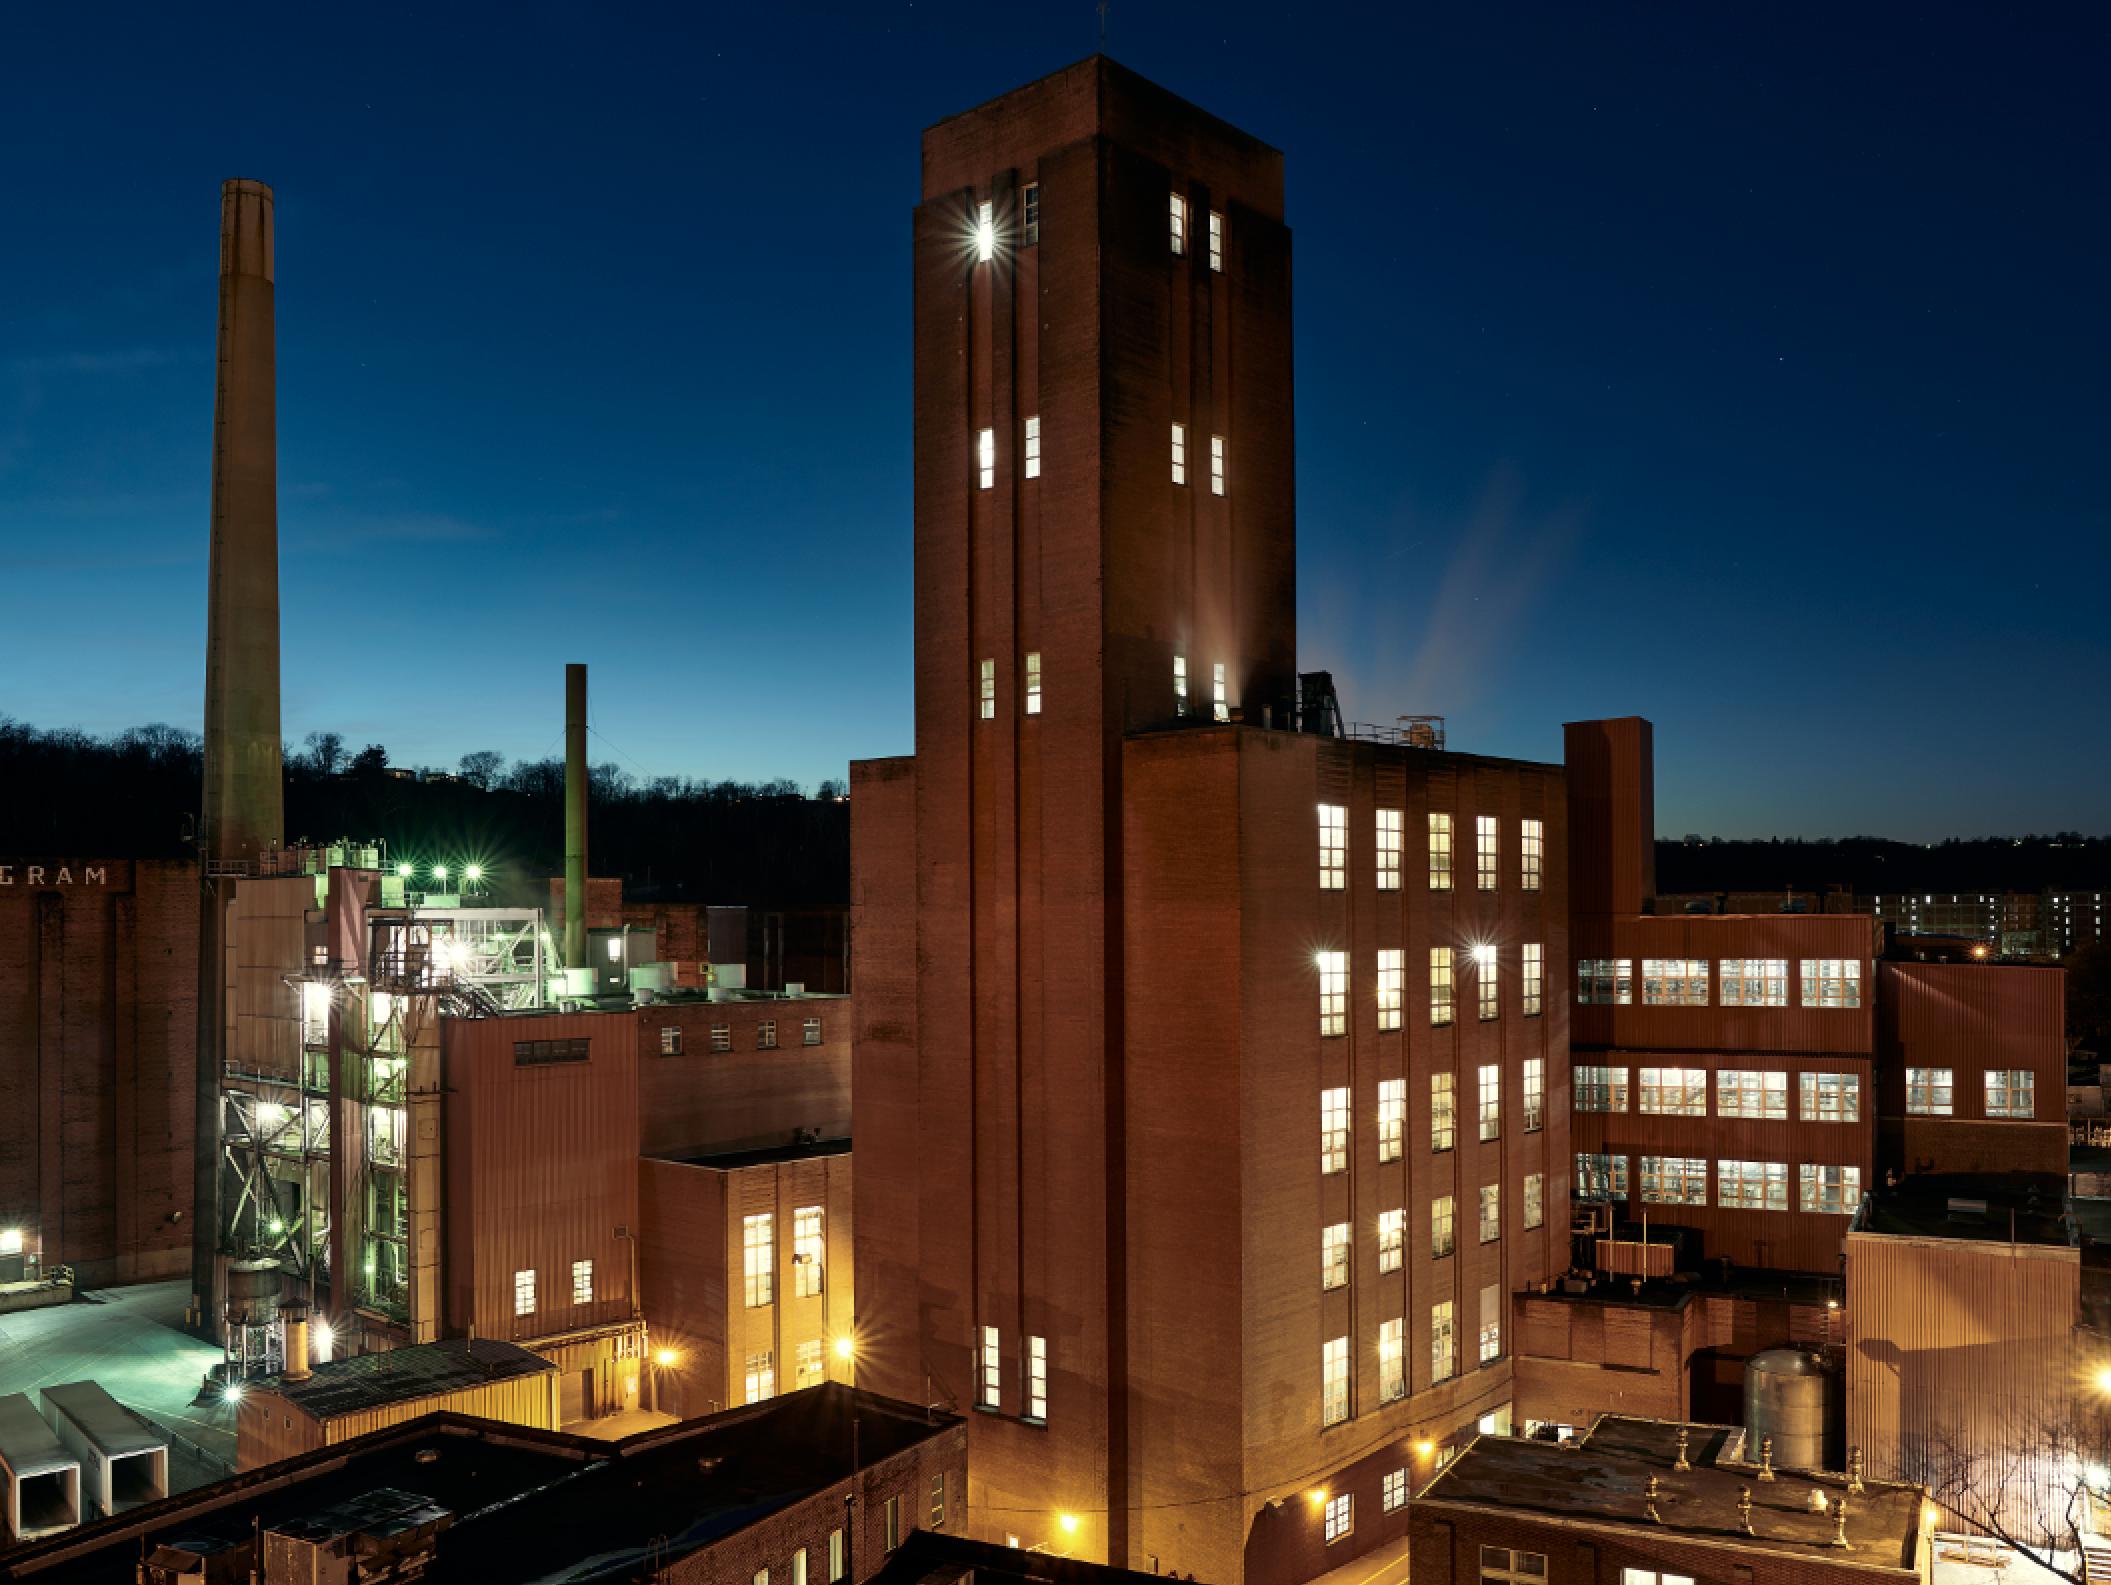 A nighttime shot of the MGP distillery in Lawrenceburg, Indiana, just outside Cincinnati.